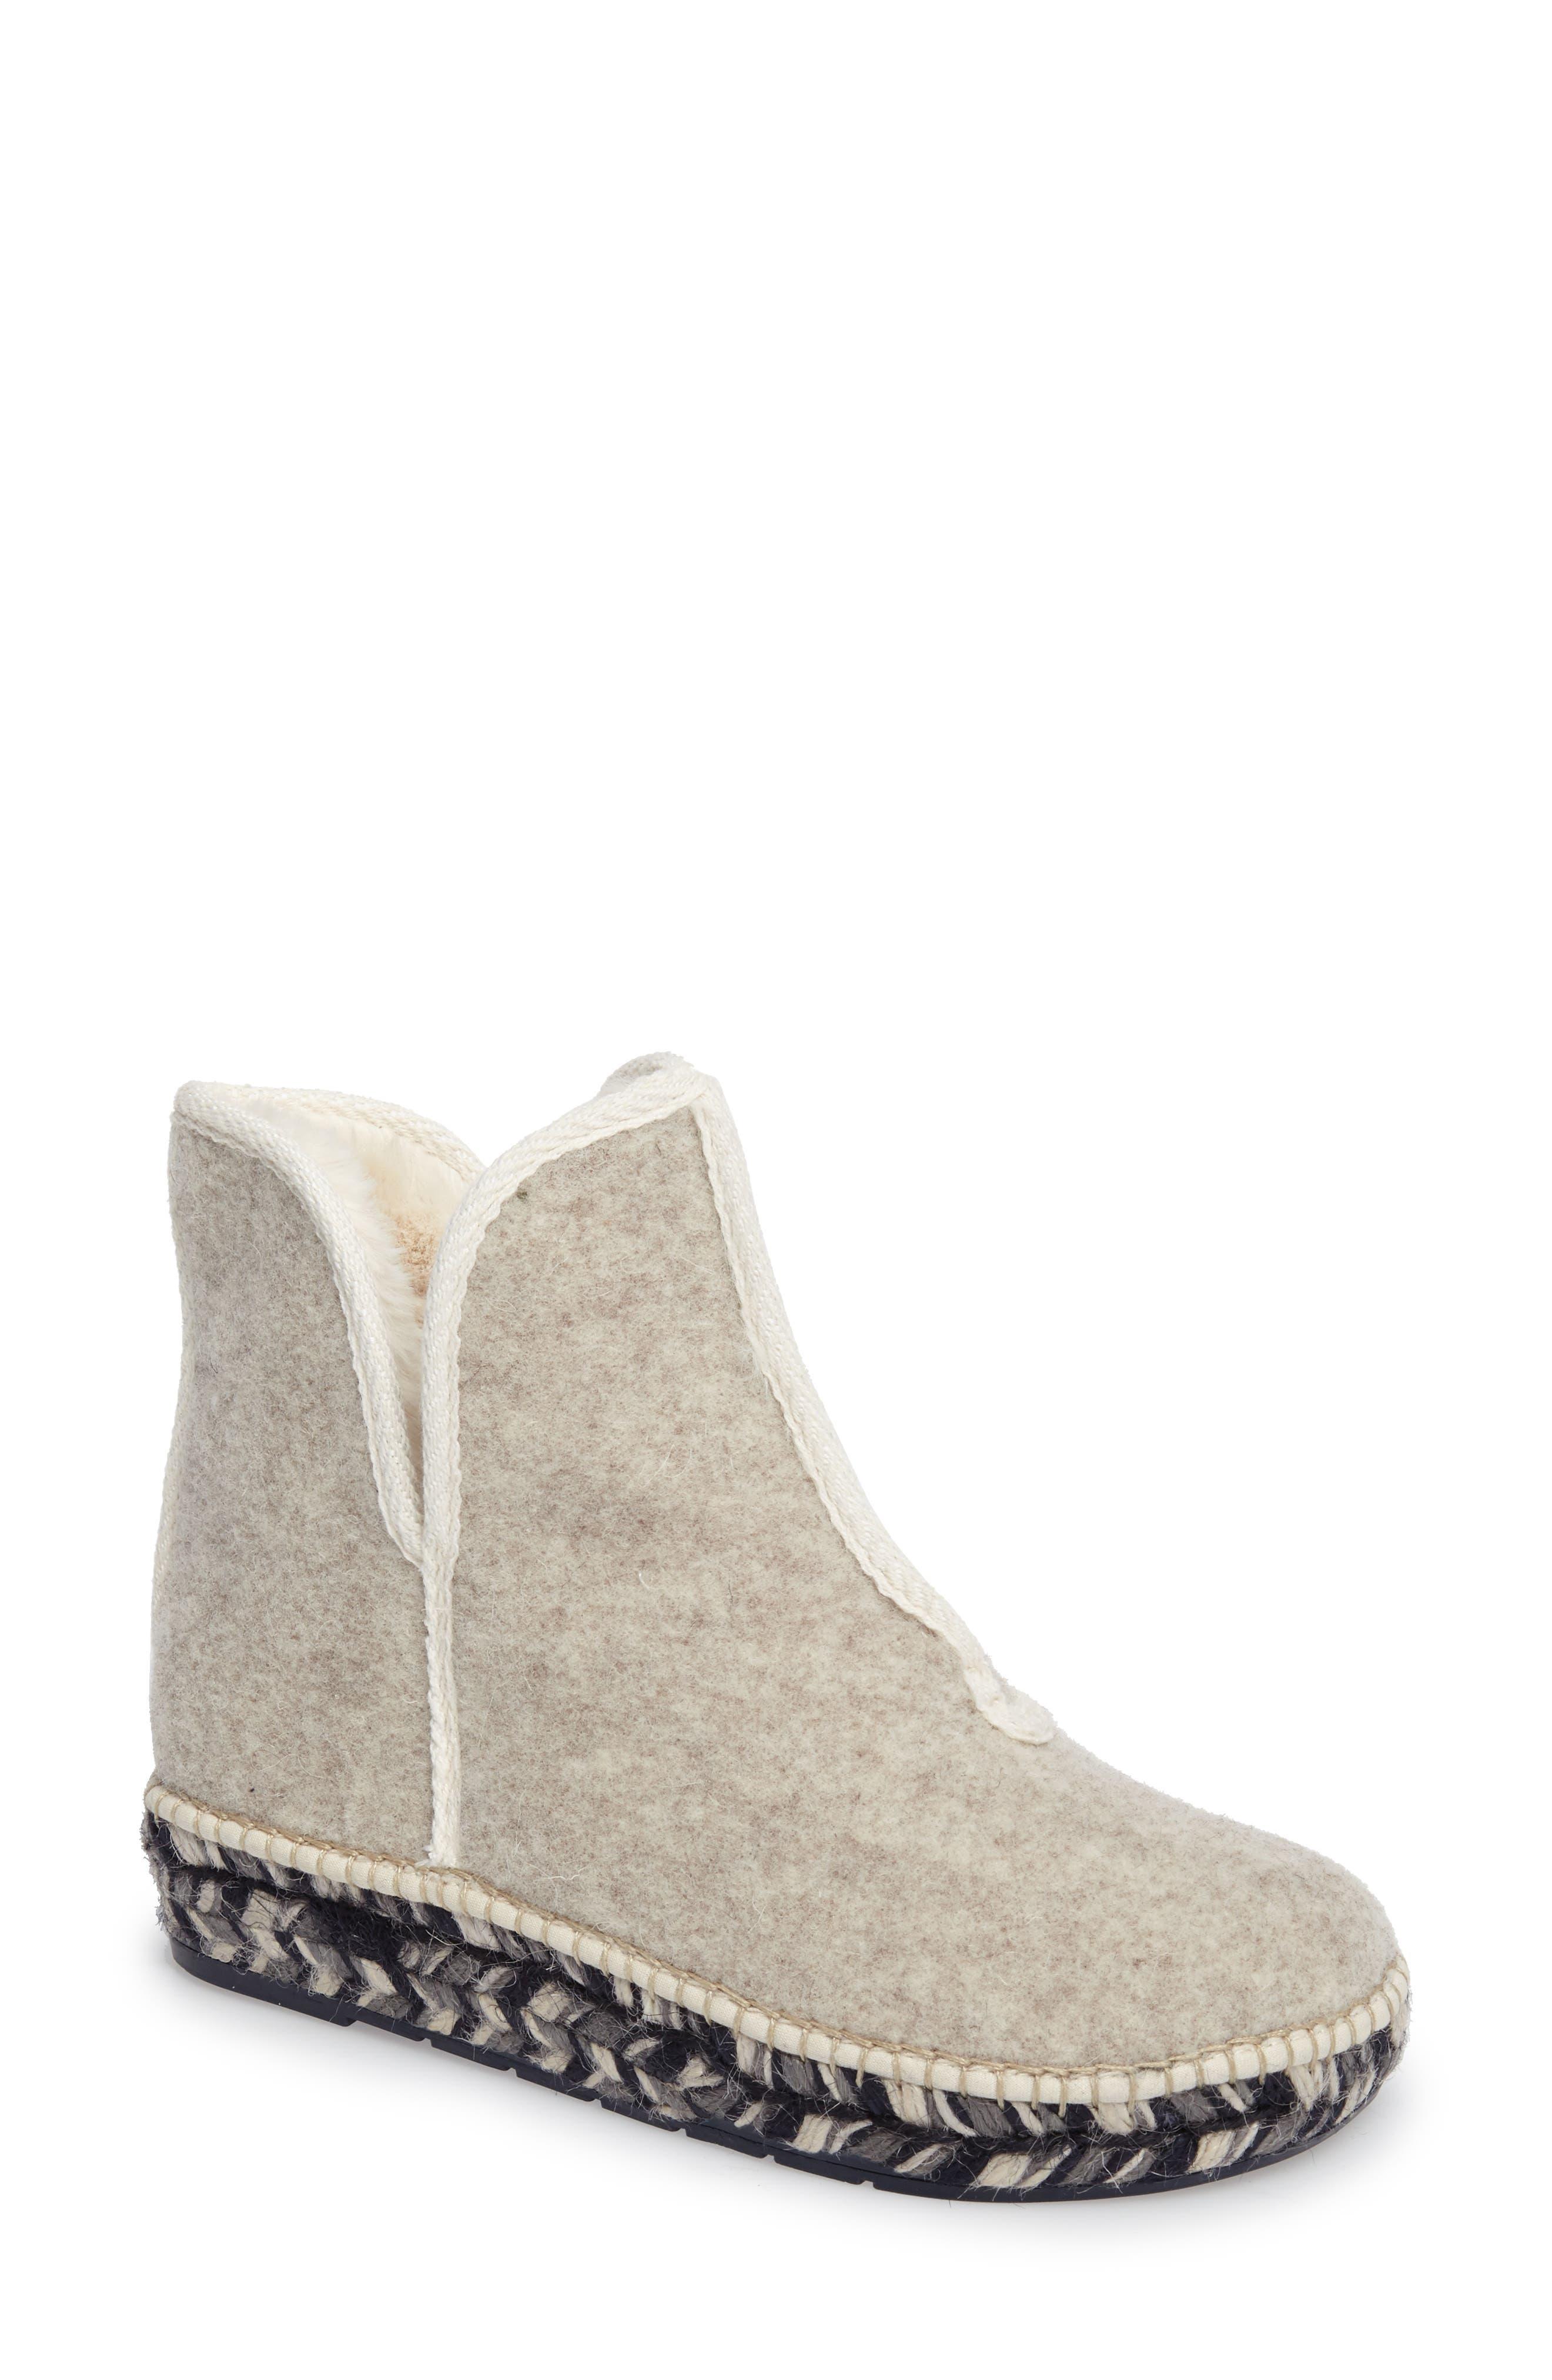 Toni Pons Espadrille Platform Bootie with Faux Fur Lining (Women)